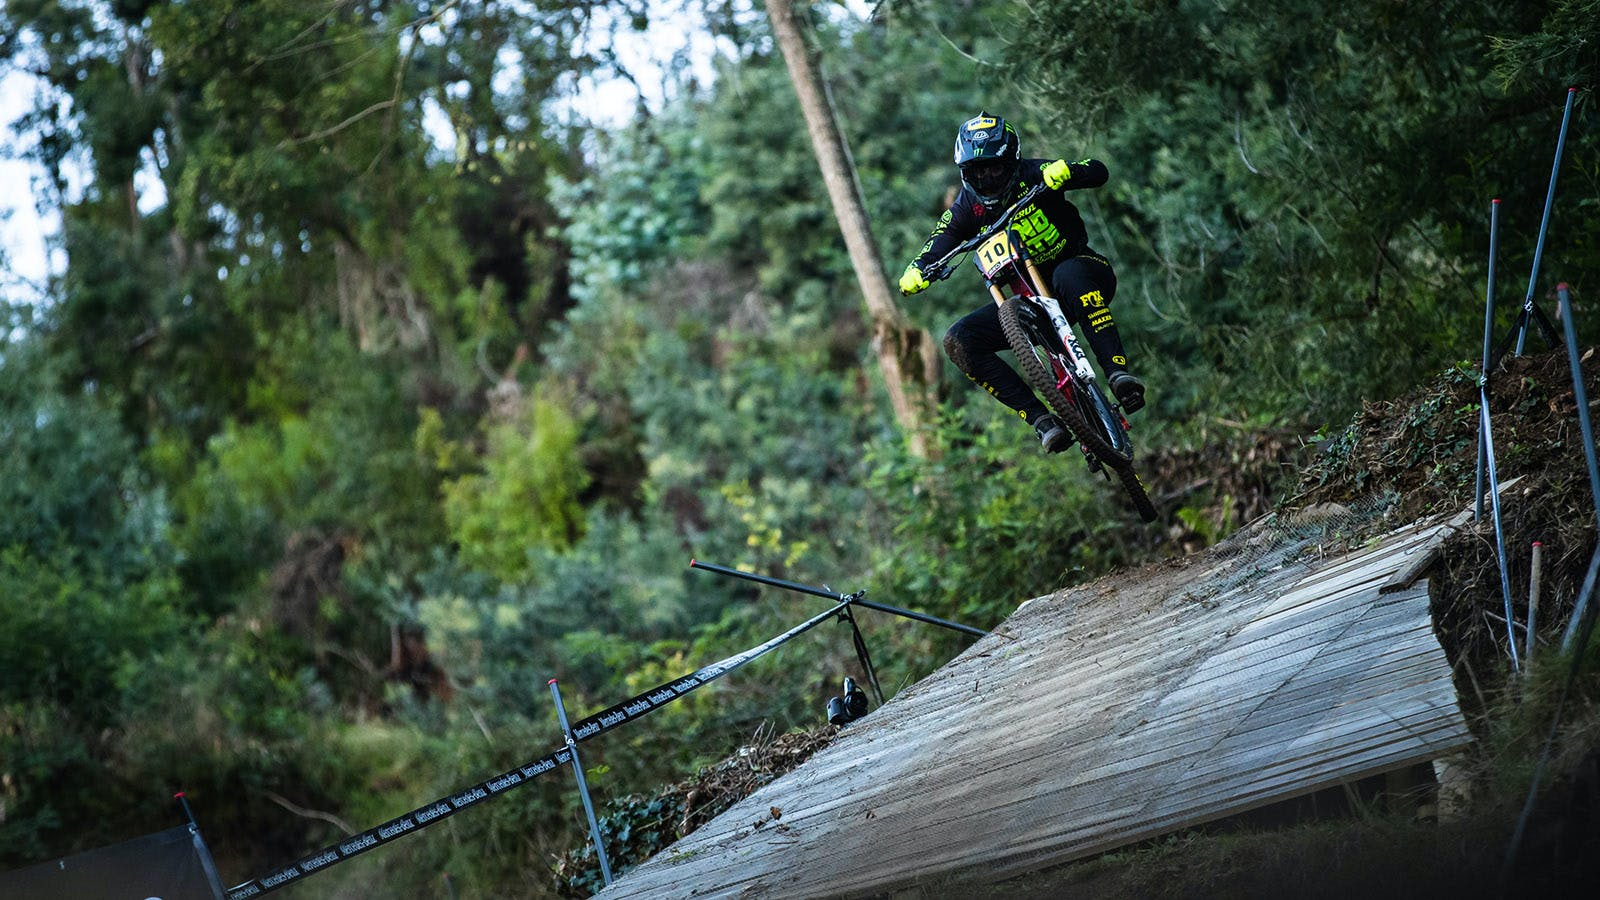 Luca Shaw jumping V10 downhill bike